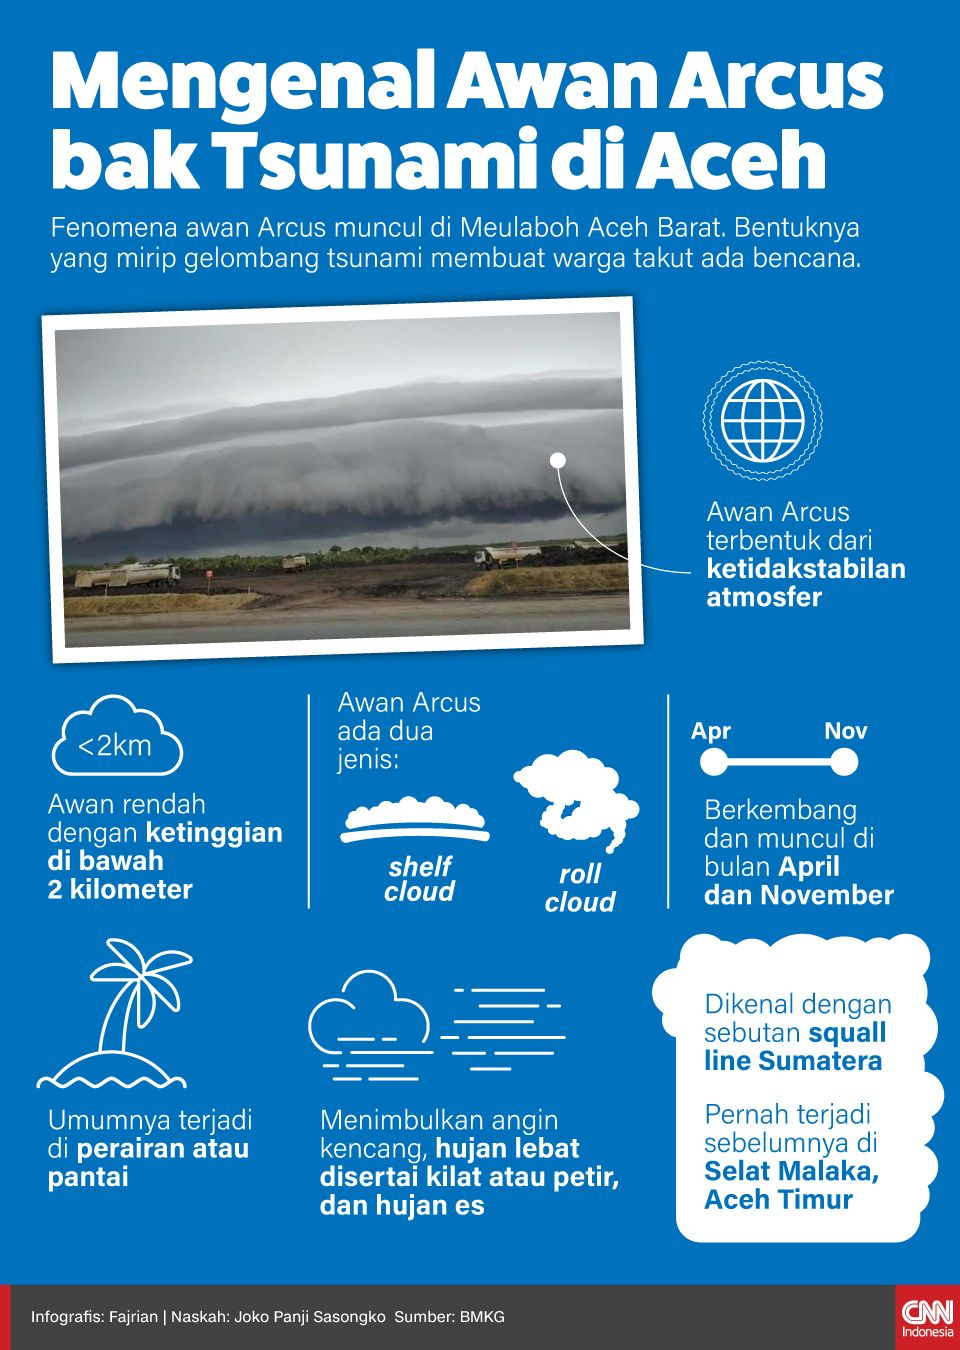 Mengenal Awan Arcus Bak Tsunami Di Aceh Tsunami Geek Meme Just For Laughs